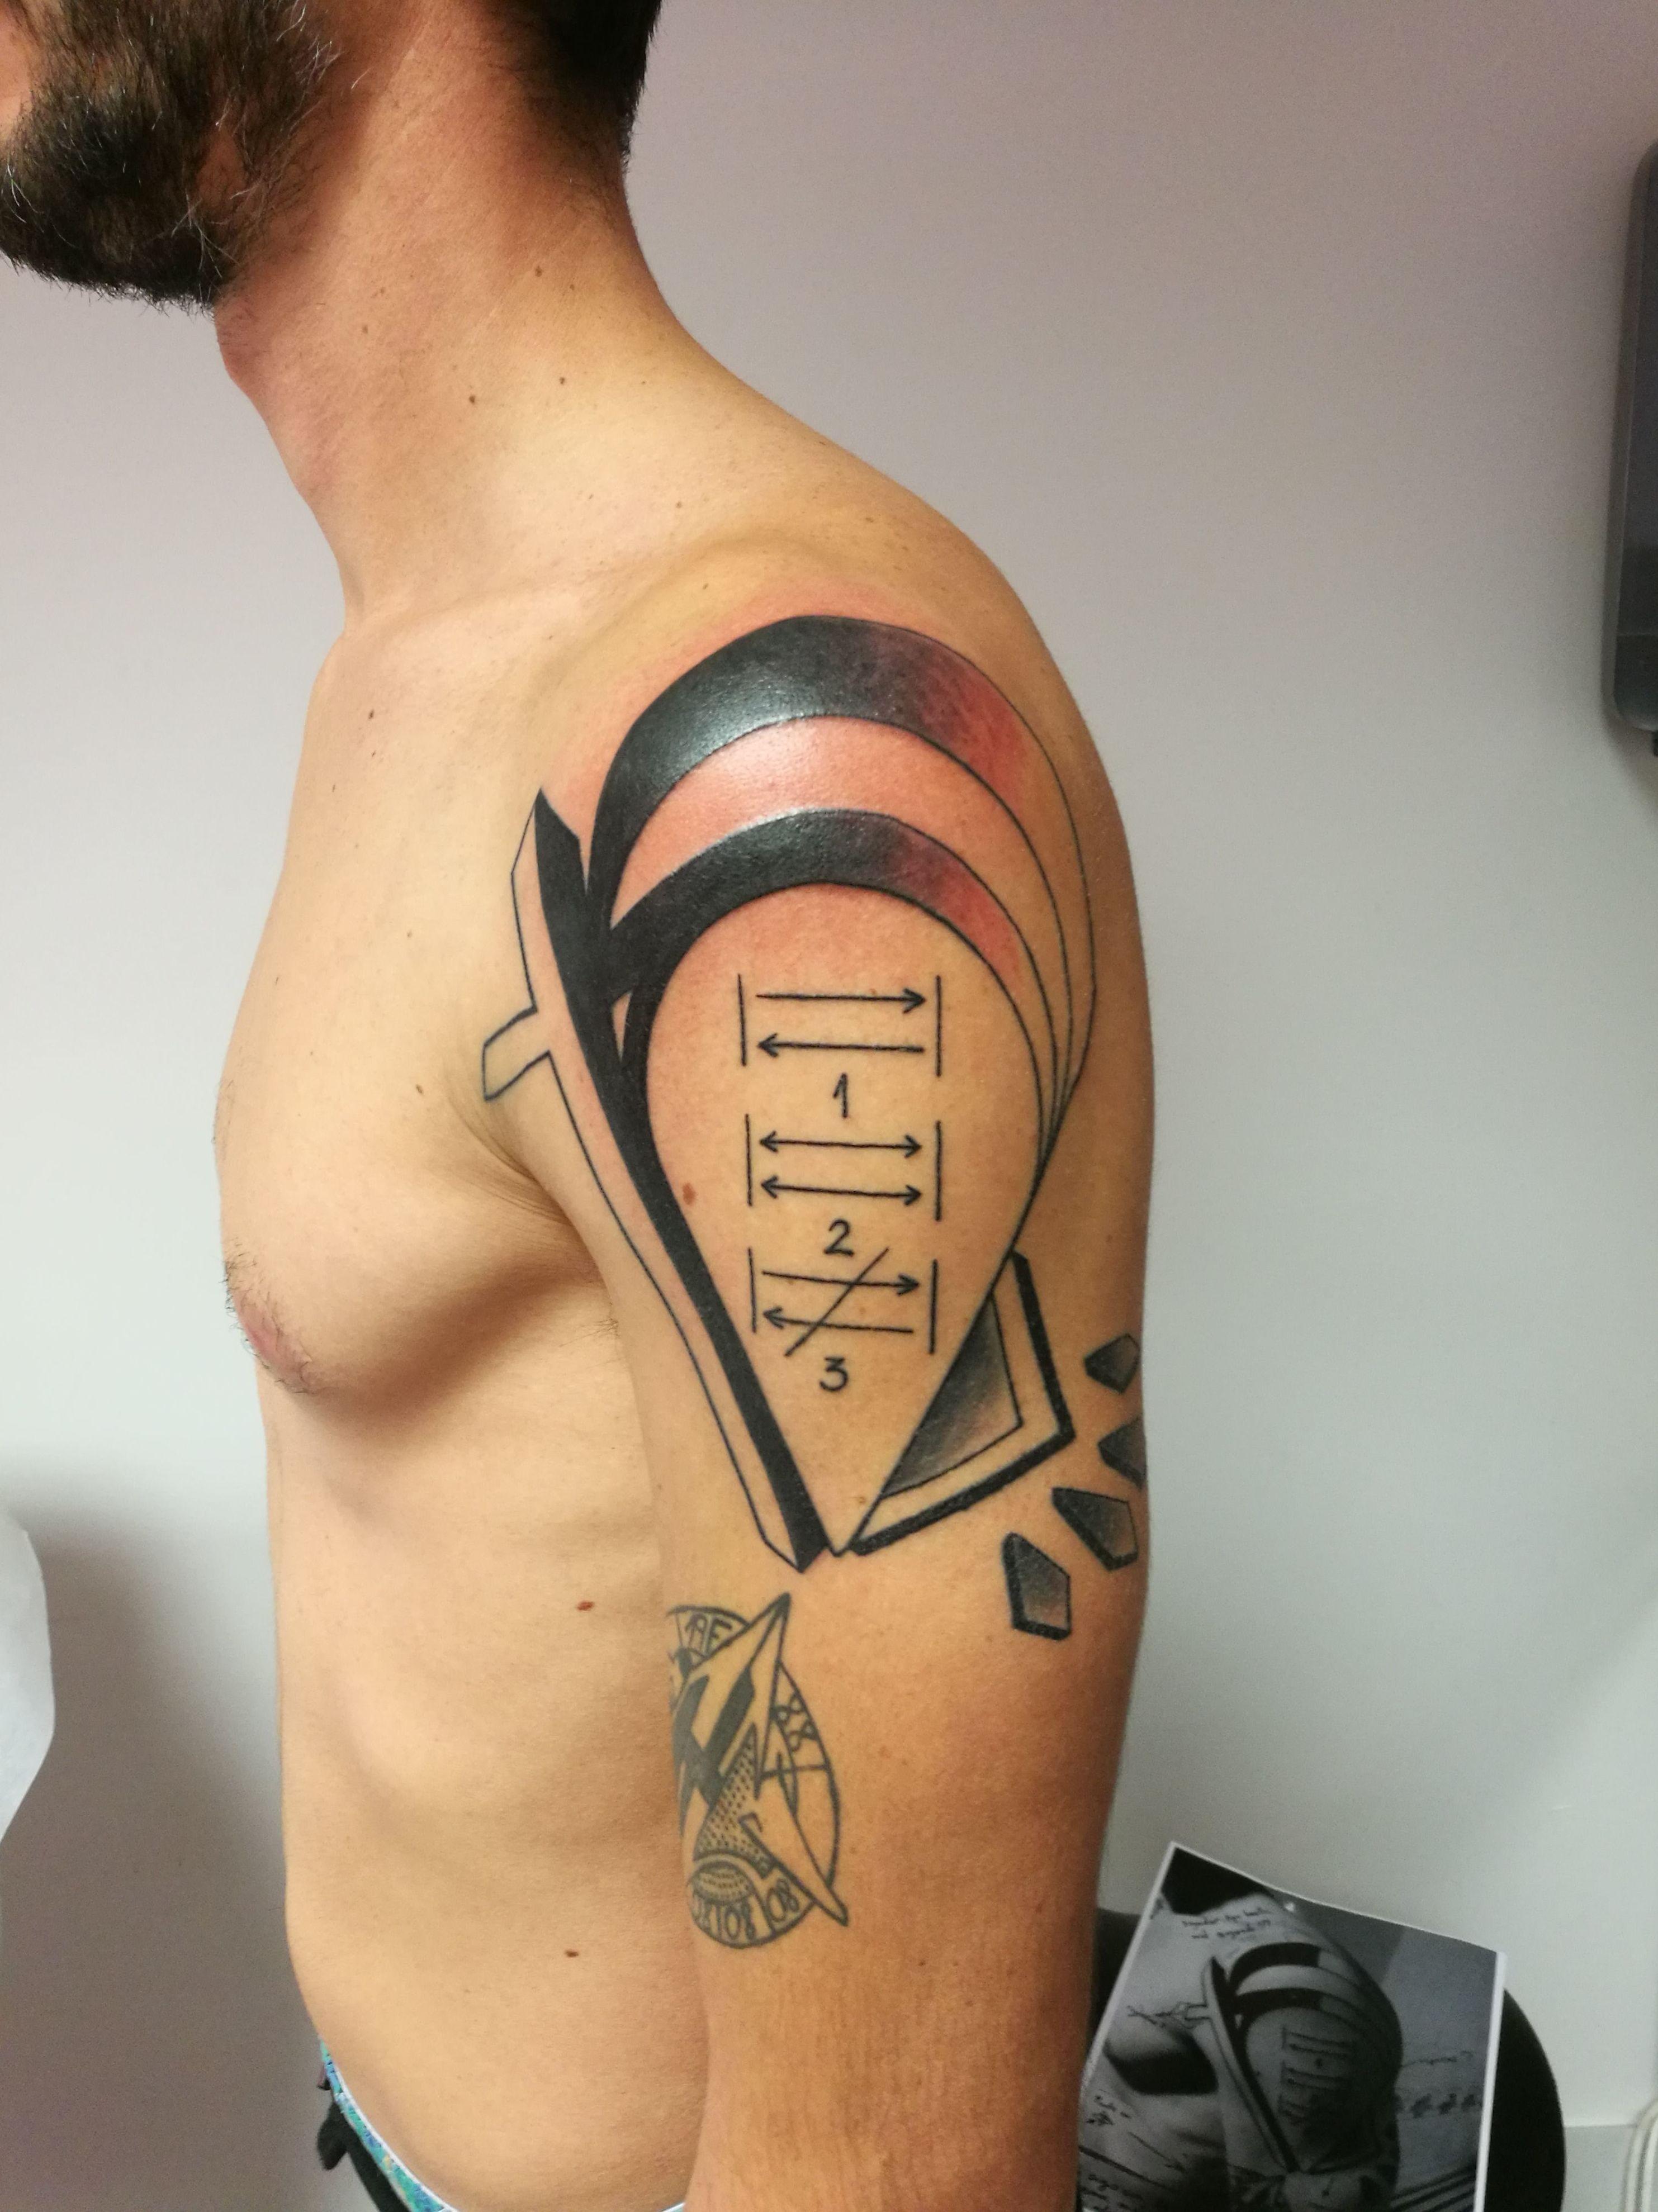 Foto 16 de Tatuajes en Majadahonda | Tatulandia Piercing Center